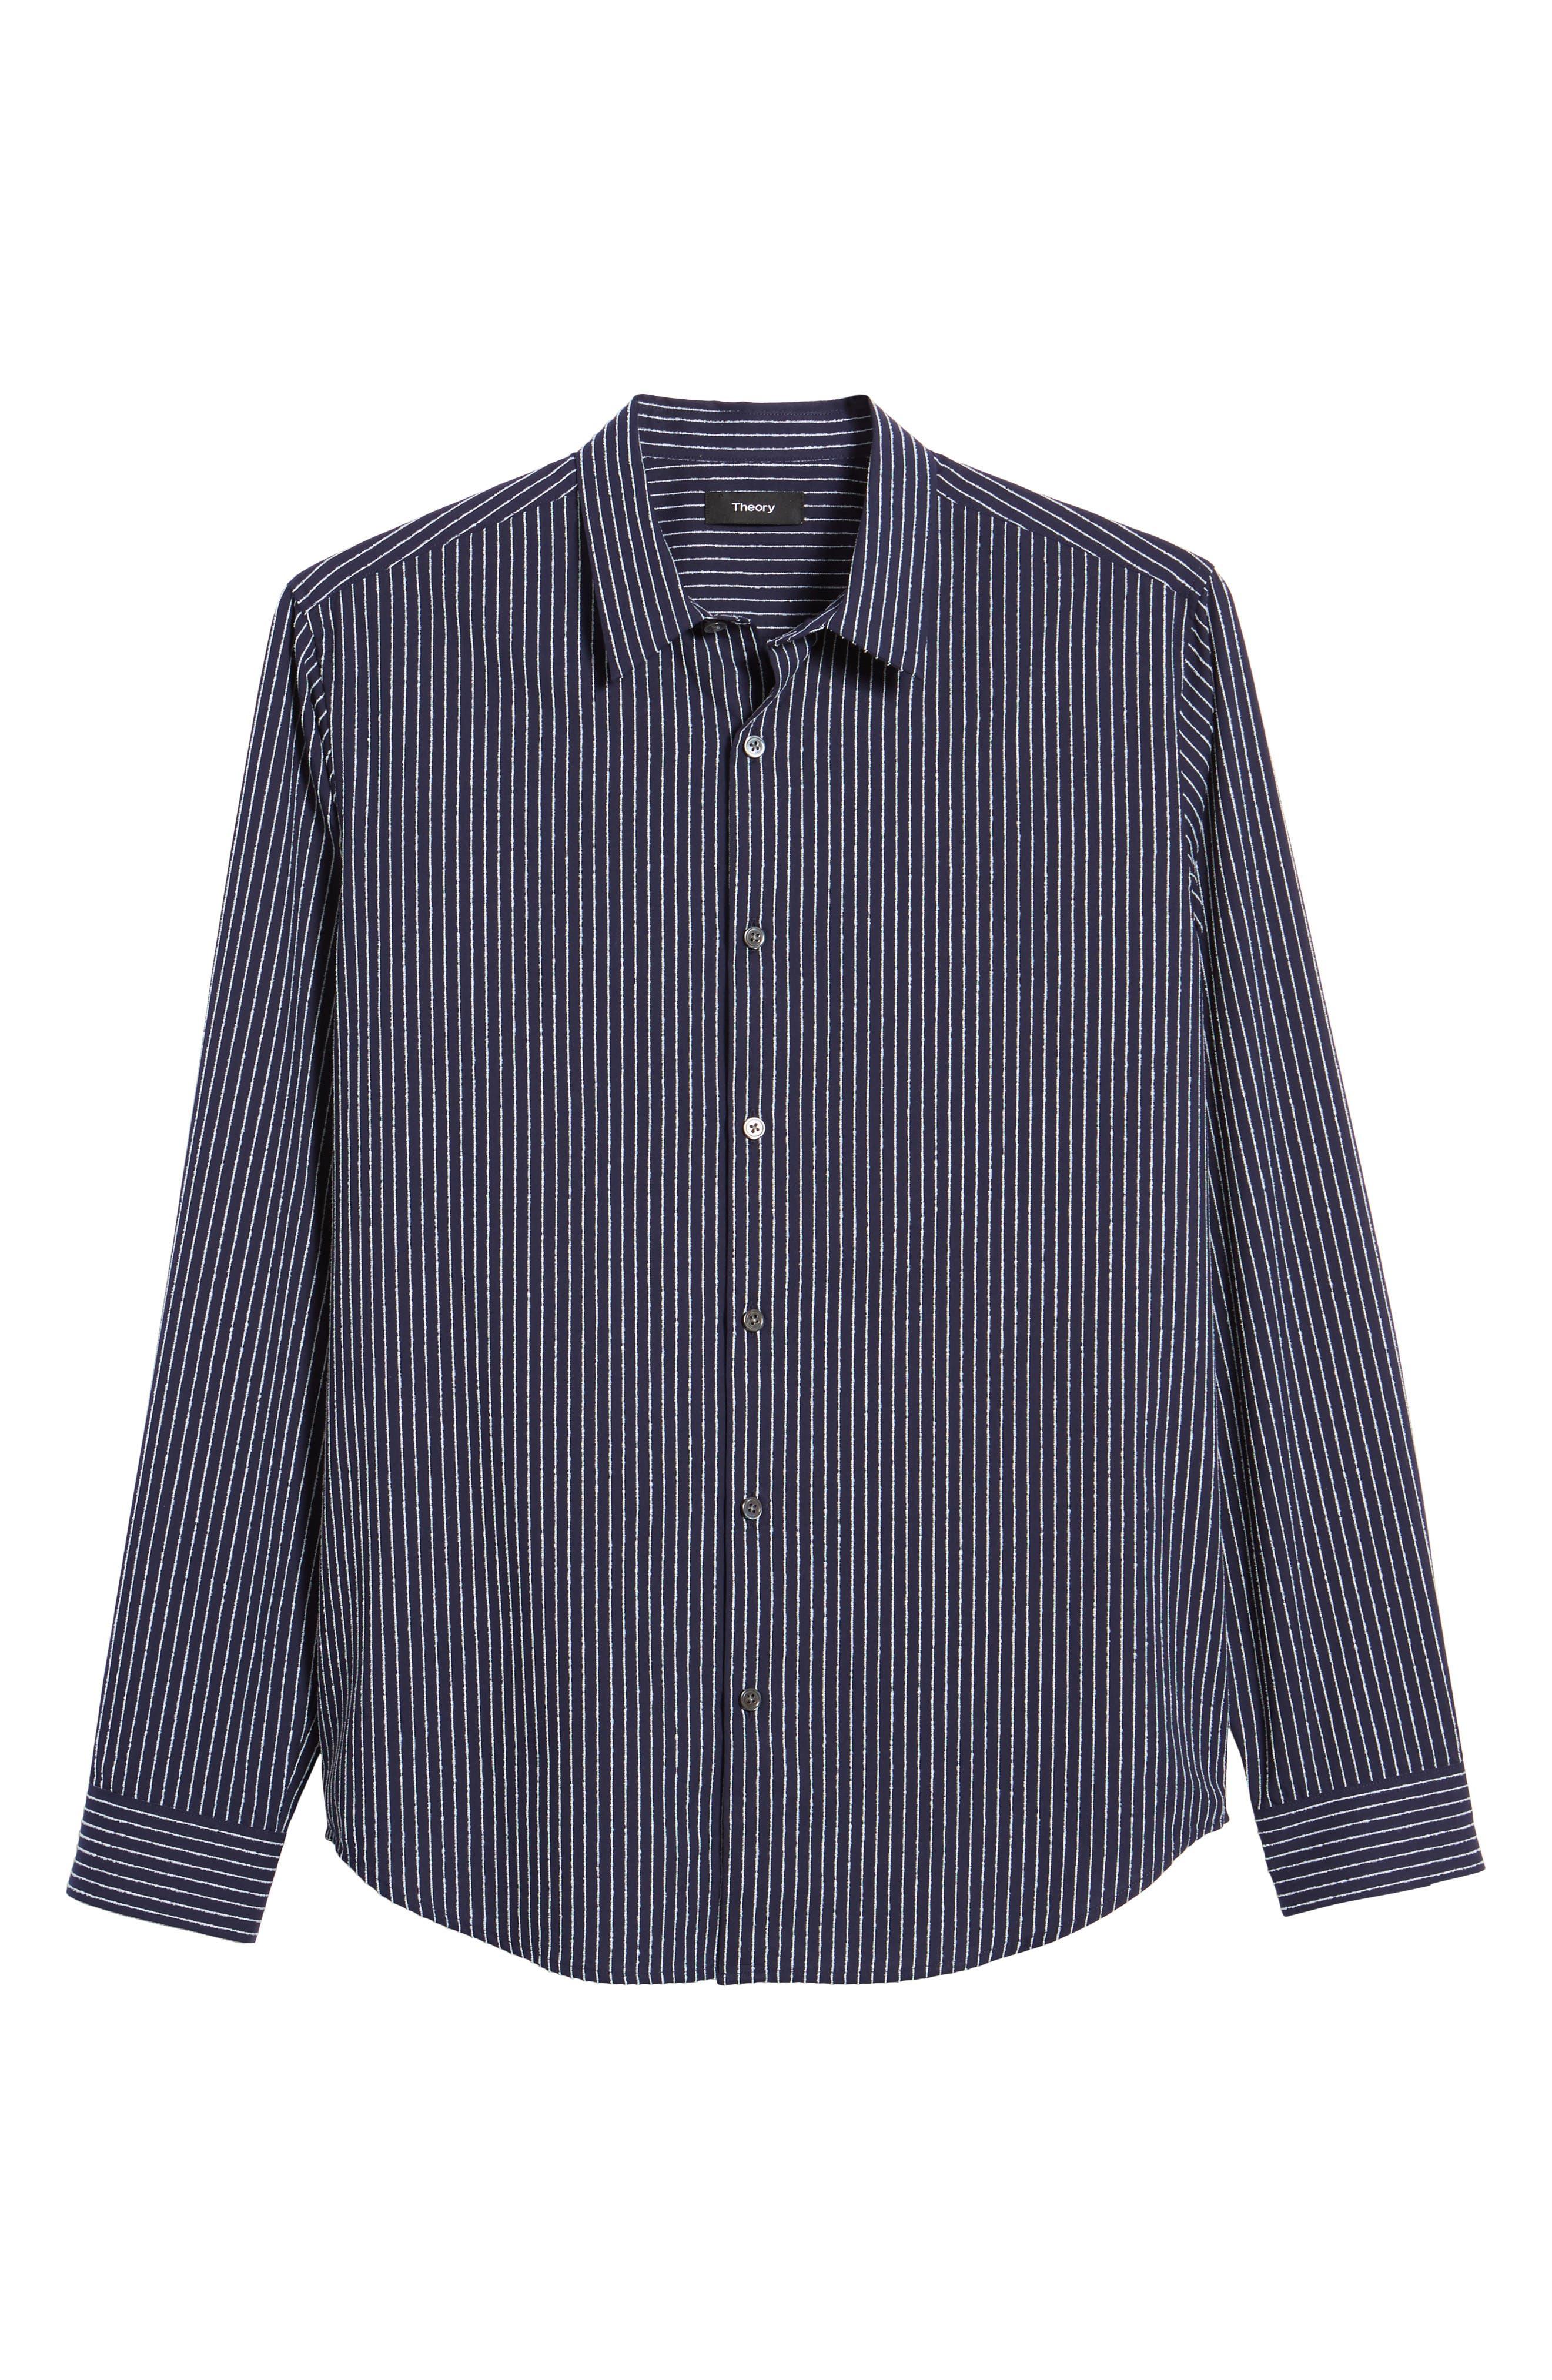 Irving Chenille Stripe Sport Shirt,                             Alternate thumbnail 6, color,                             Eclipse Stripe